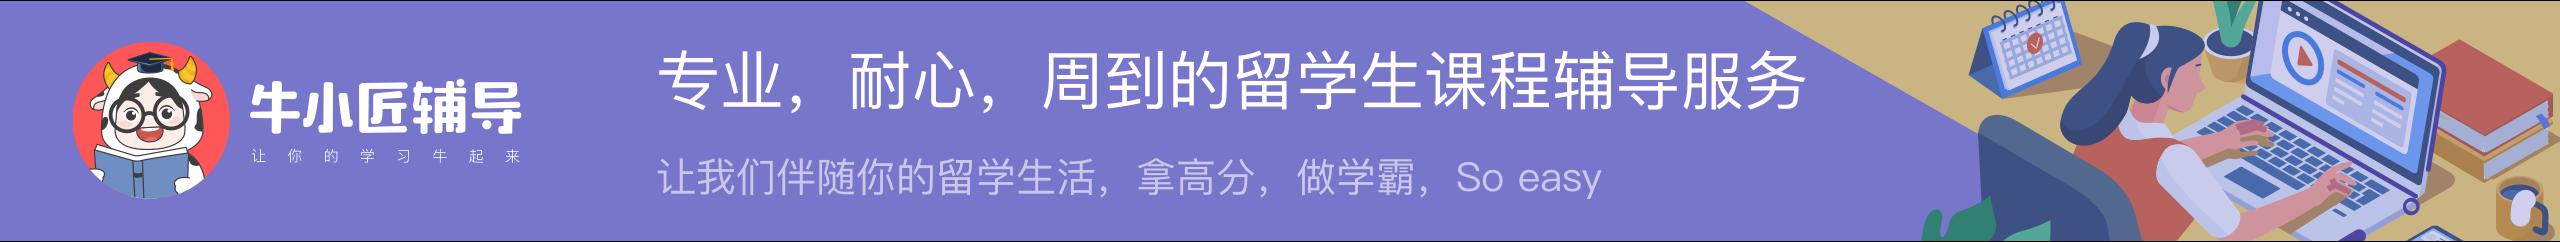 university ad banner